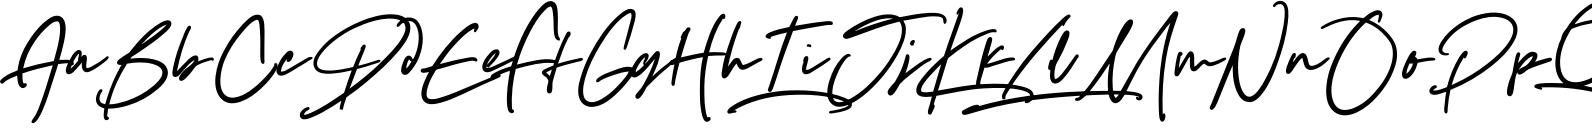 Distinct Style Font Duo